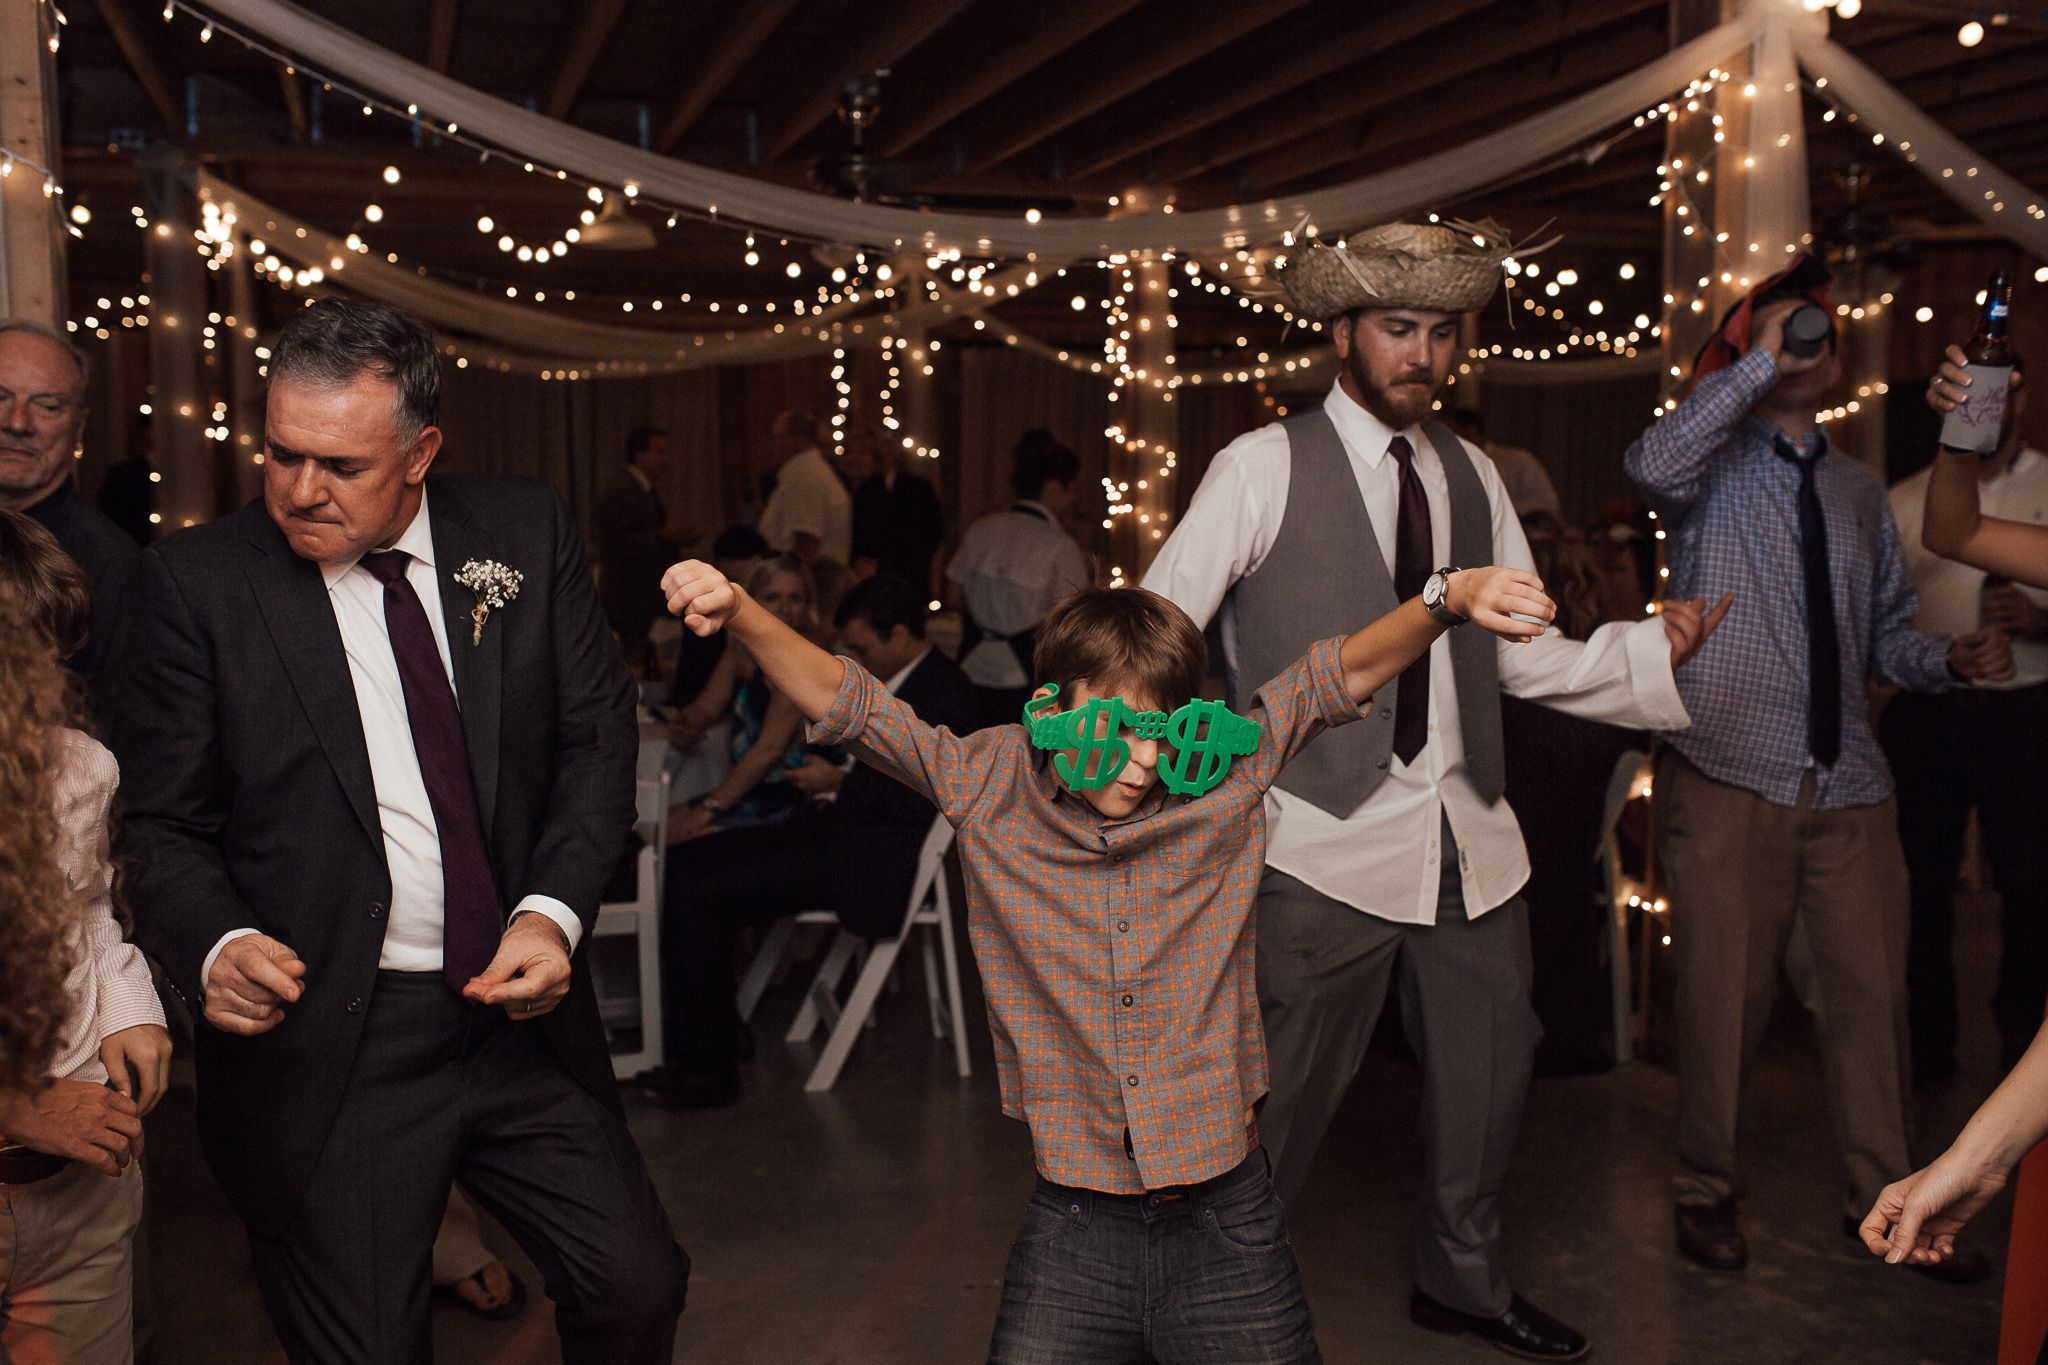 cedar-hill-farms-hernando-wedding-venue-memphis-wedding-photographer-cassie-cook-photography